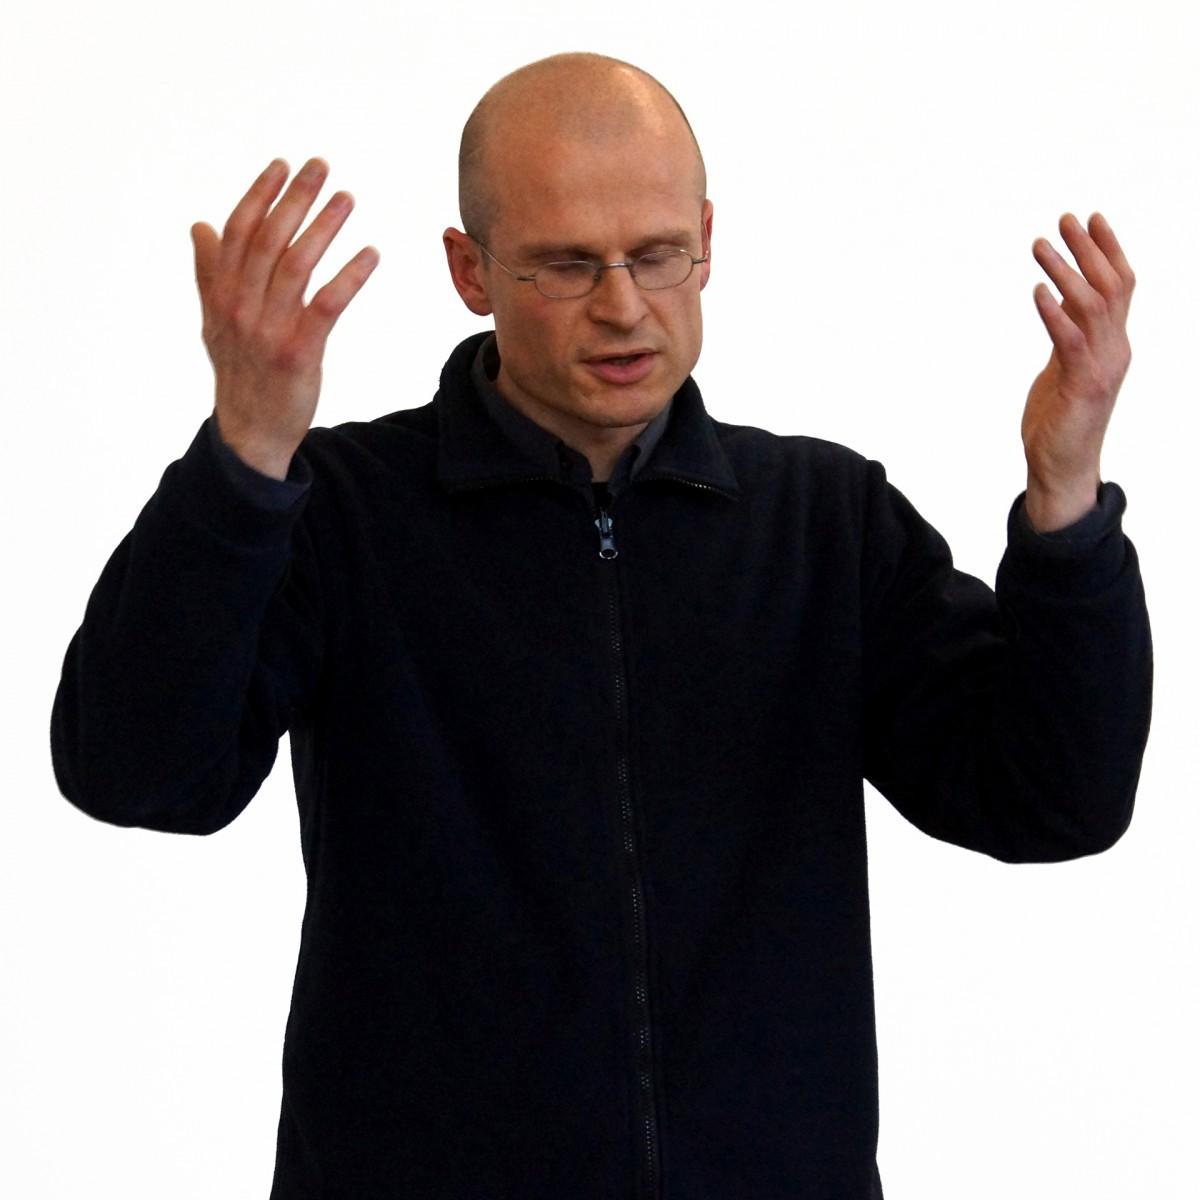 Jürgen Krause (Bild 3): Künstler im Gespräch – Kunsthaus Nürnberg (2015)